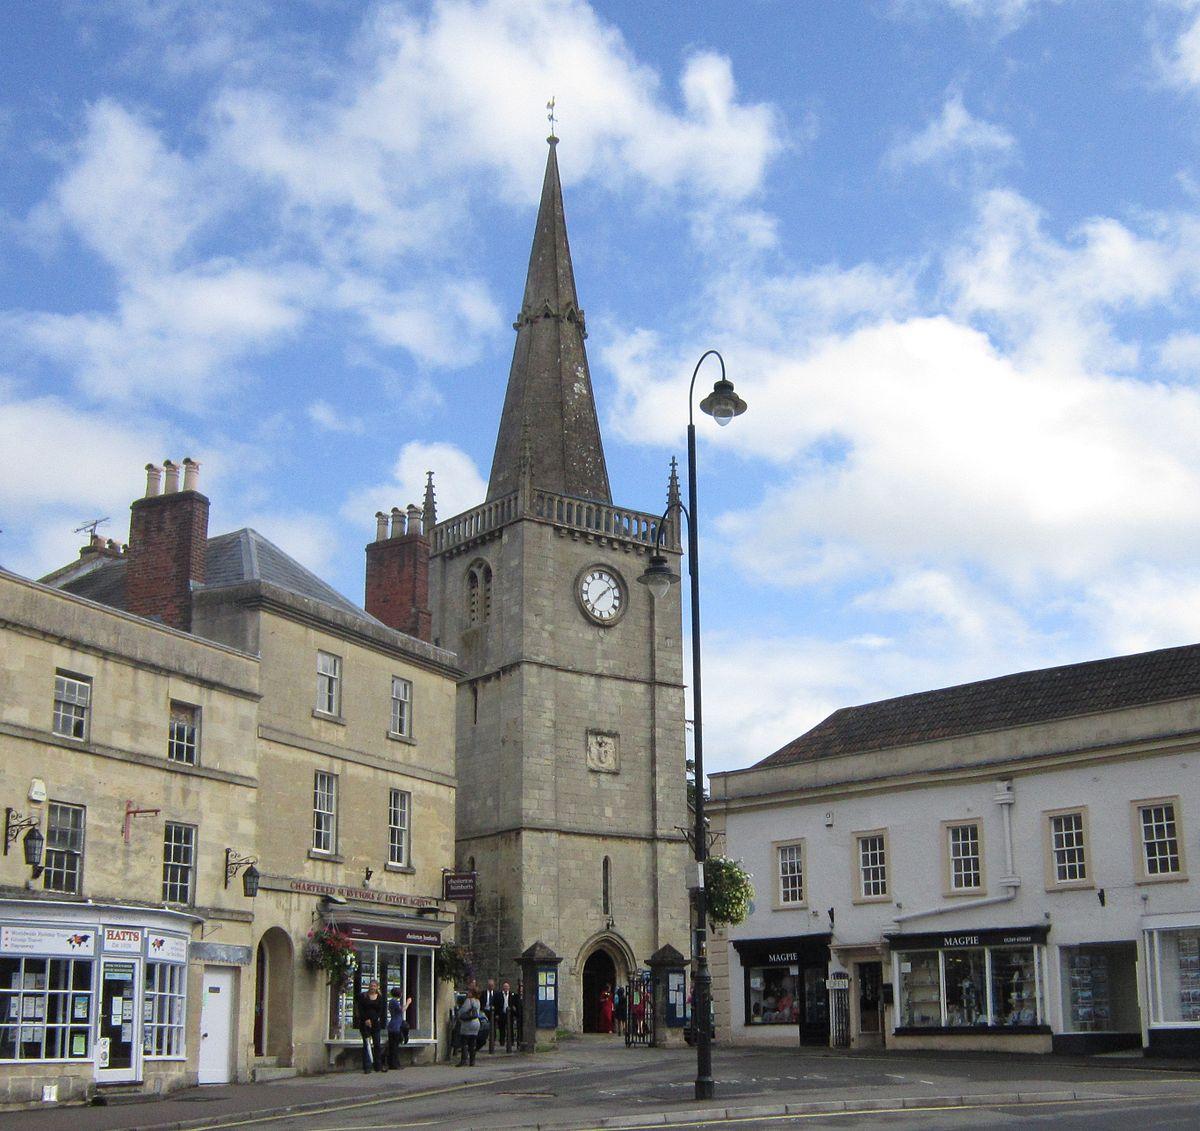 St Andrew's Church, Chippenham